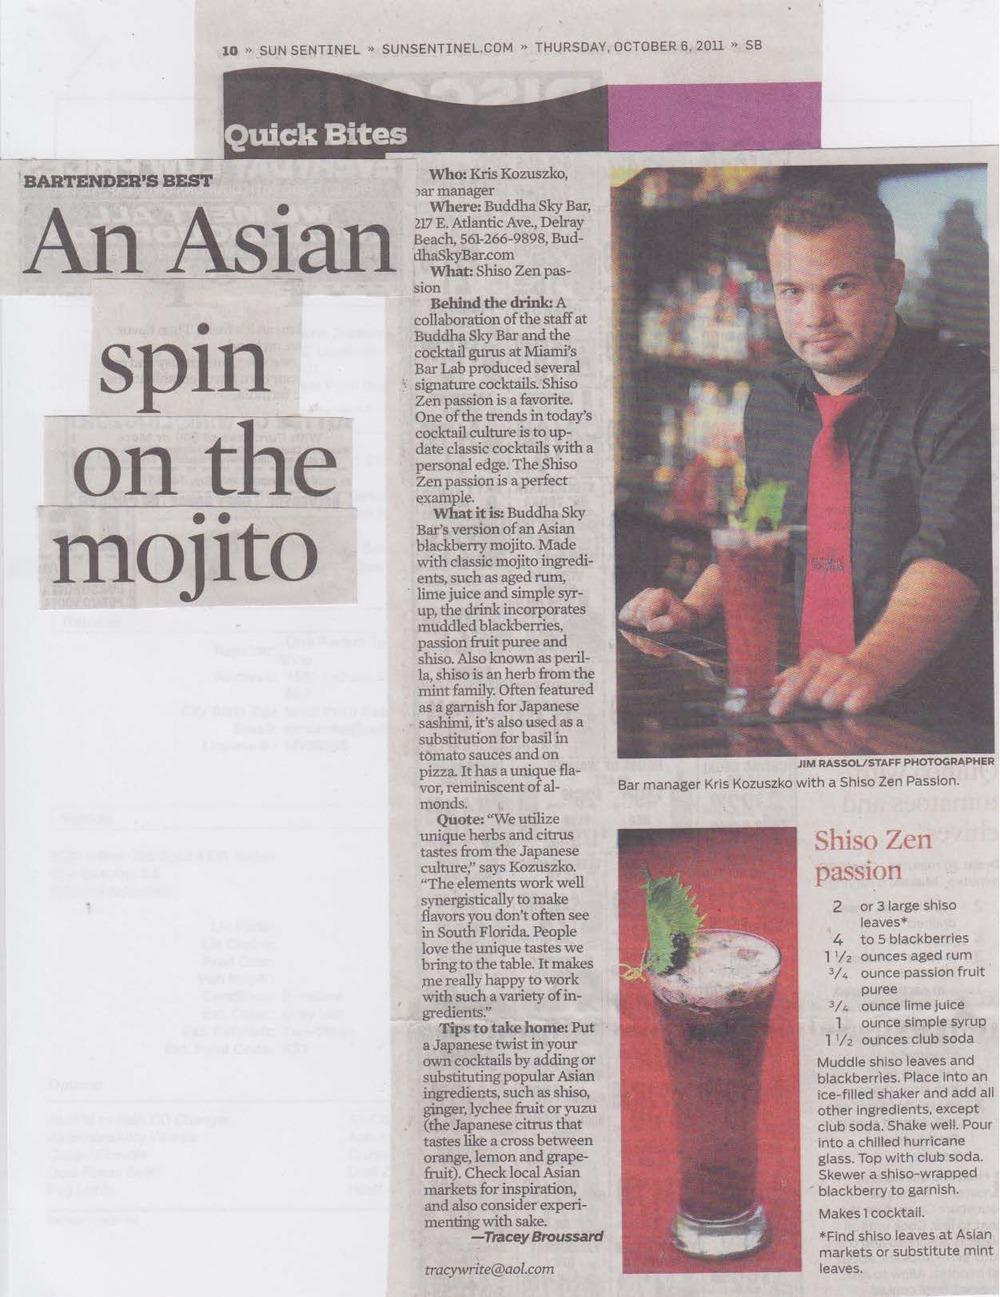 Bartenders Sun Sentinel Print 10.6.11.jpg